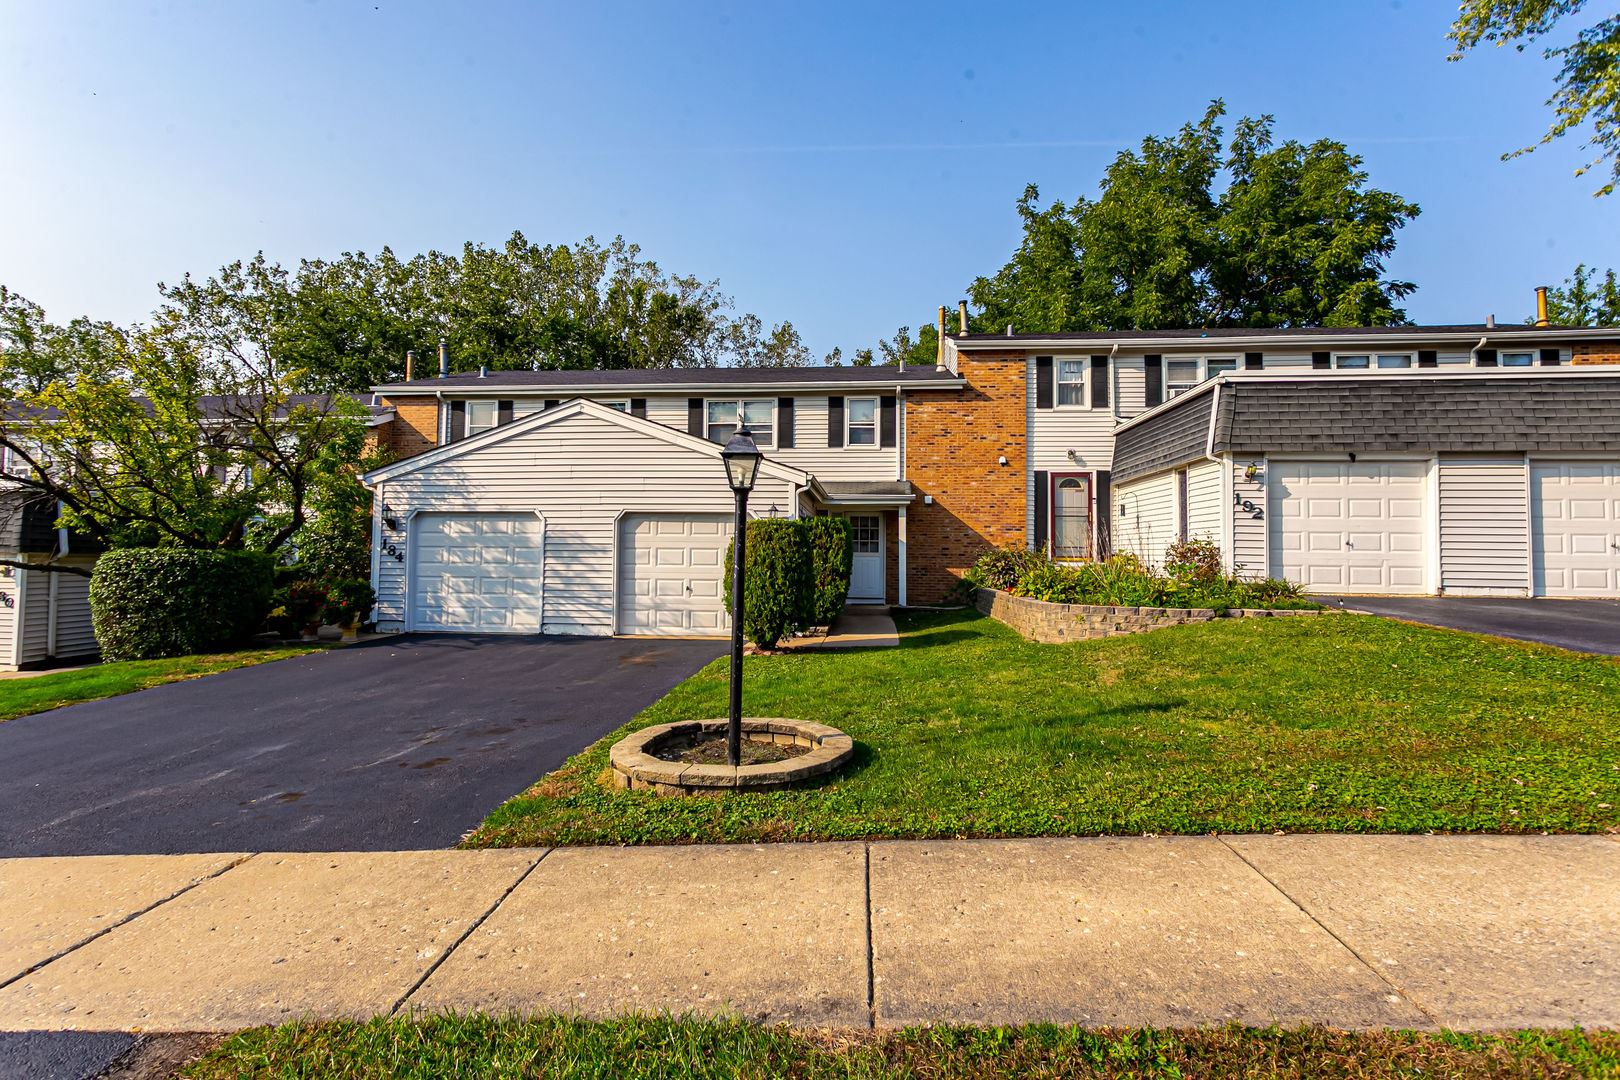 Photo of 188 Pamela Drive, Bolingbrook, IL 60440 (MLS # 10892936)